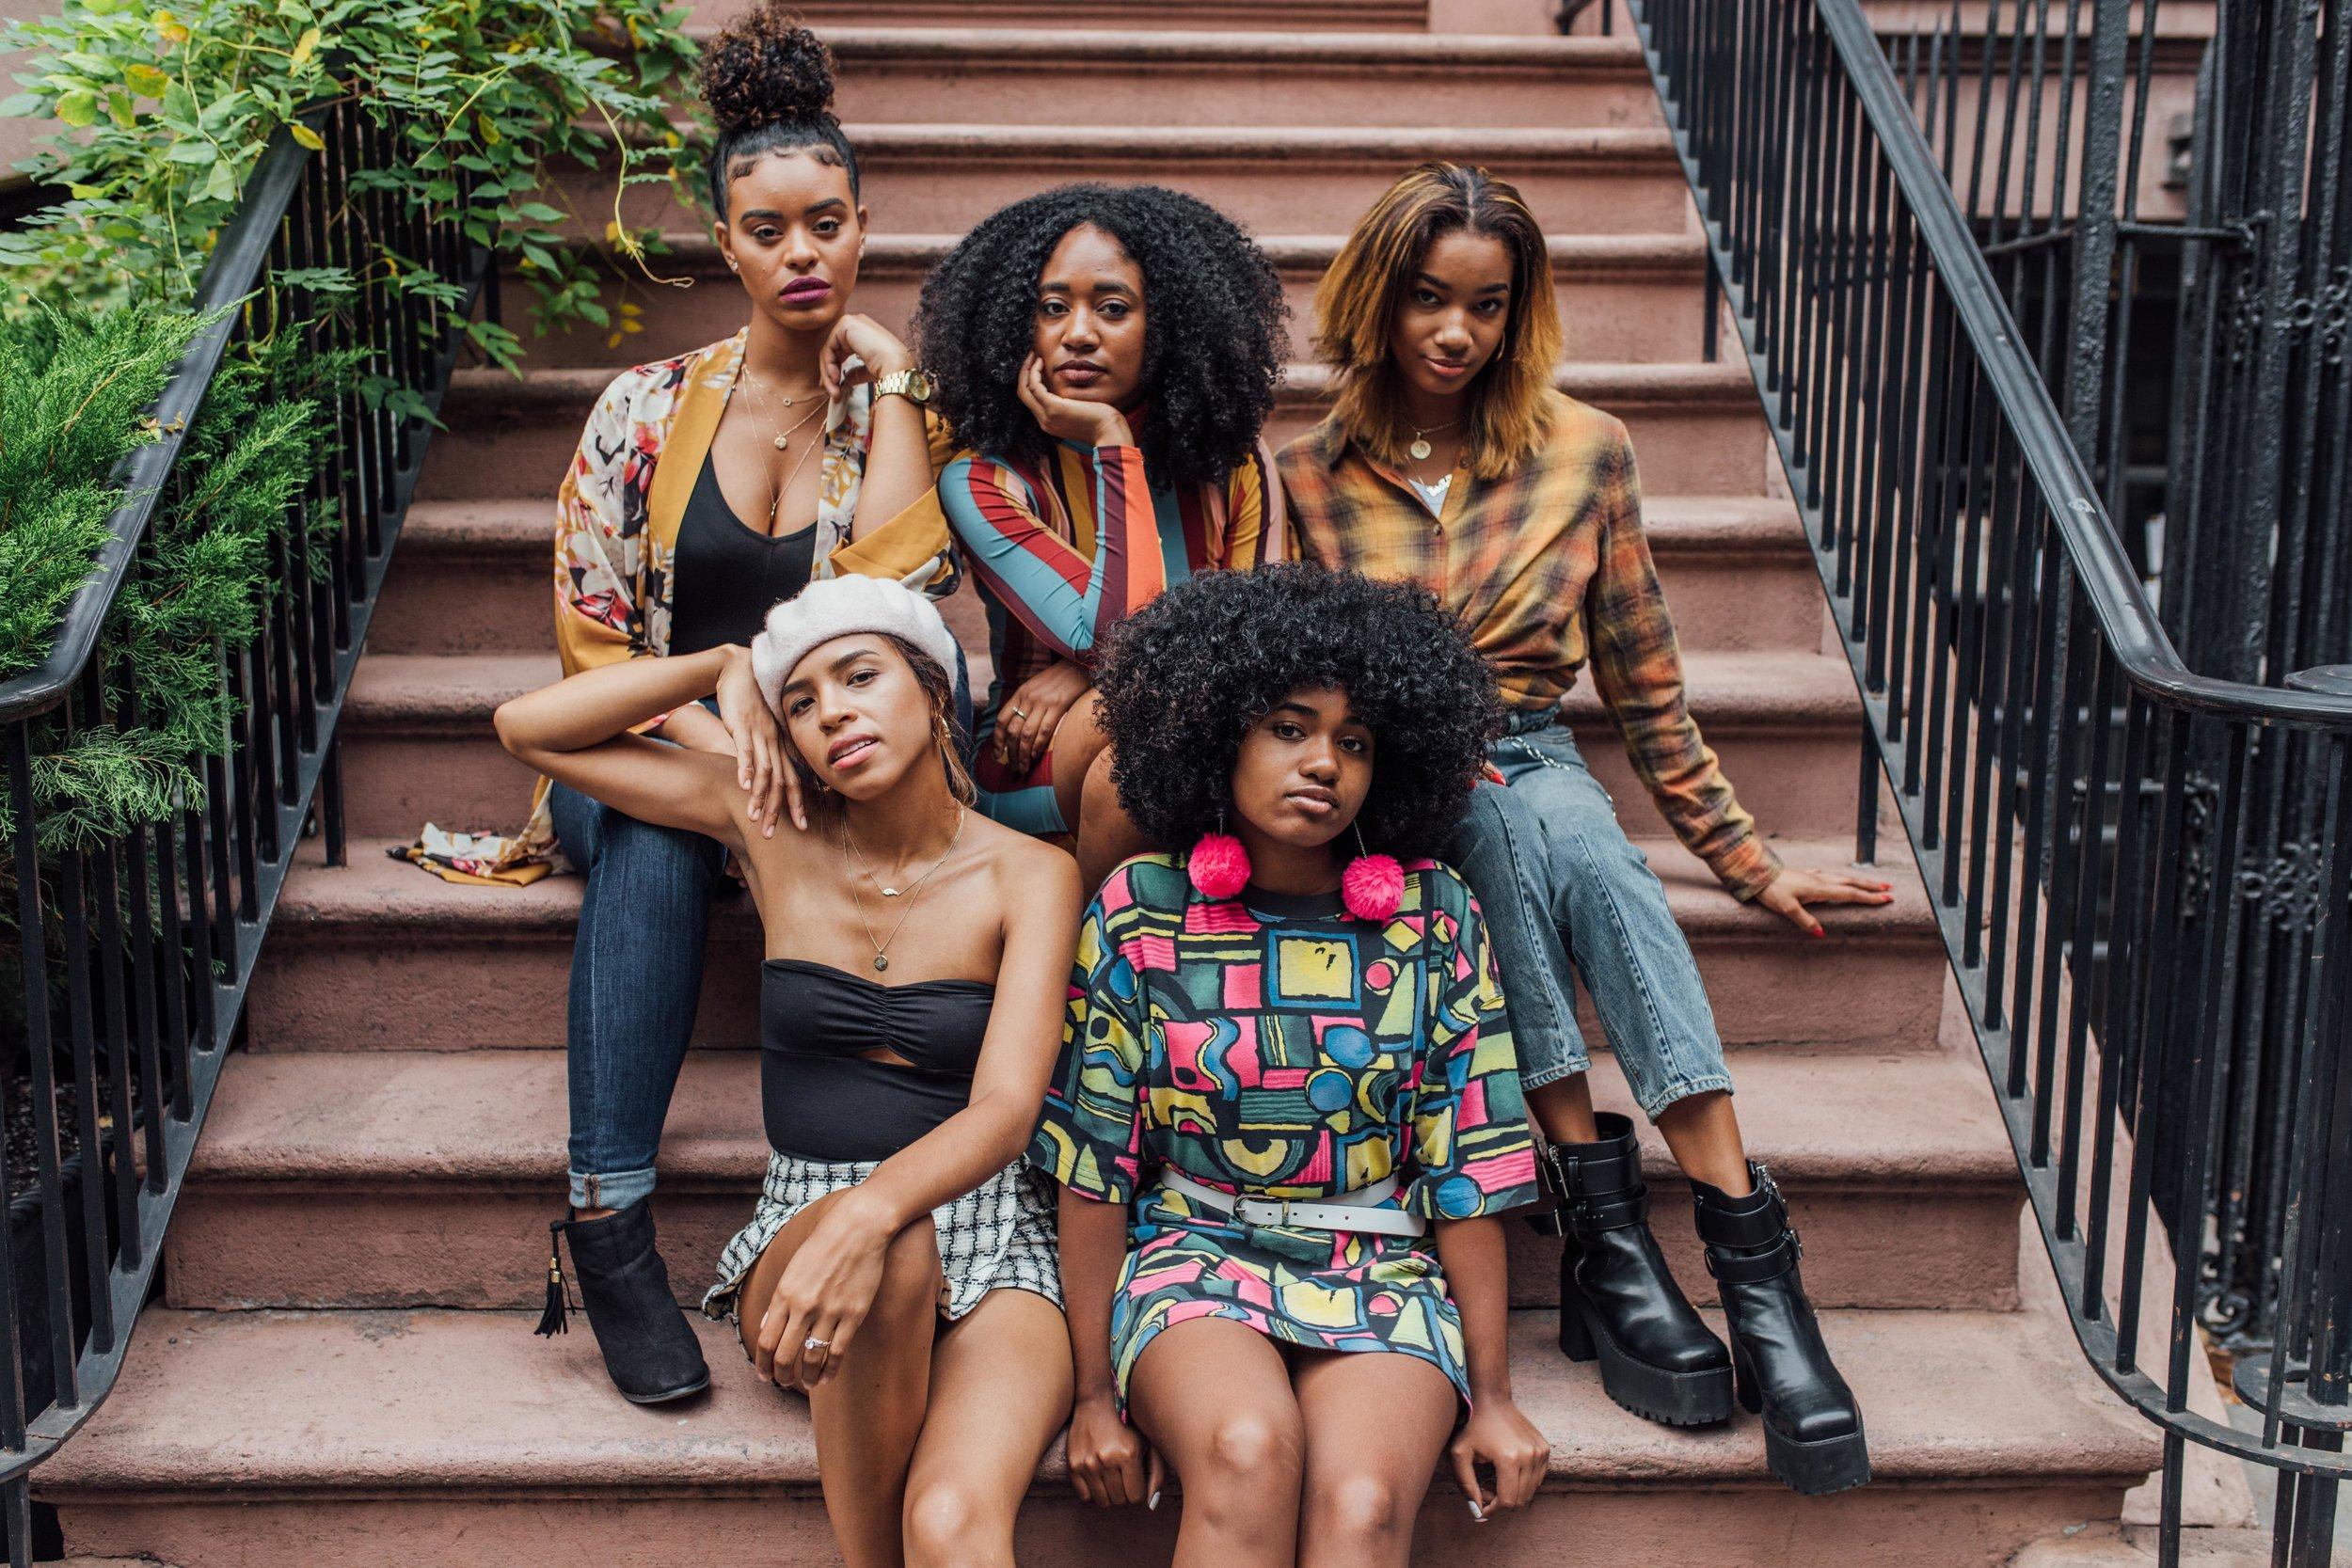 new_york_city_fashion_photographer (8 of 8).jpg